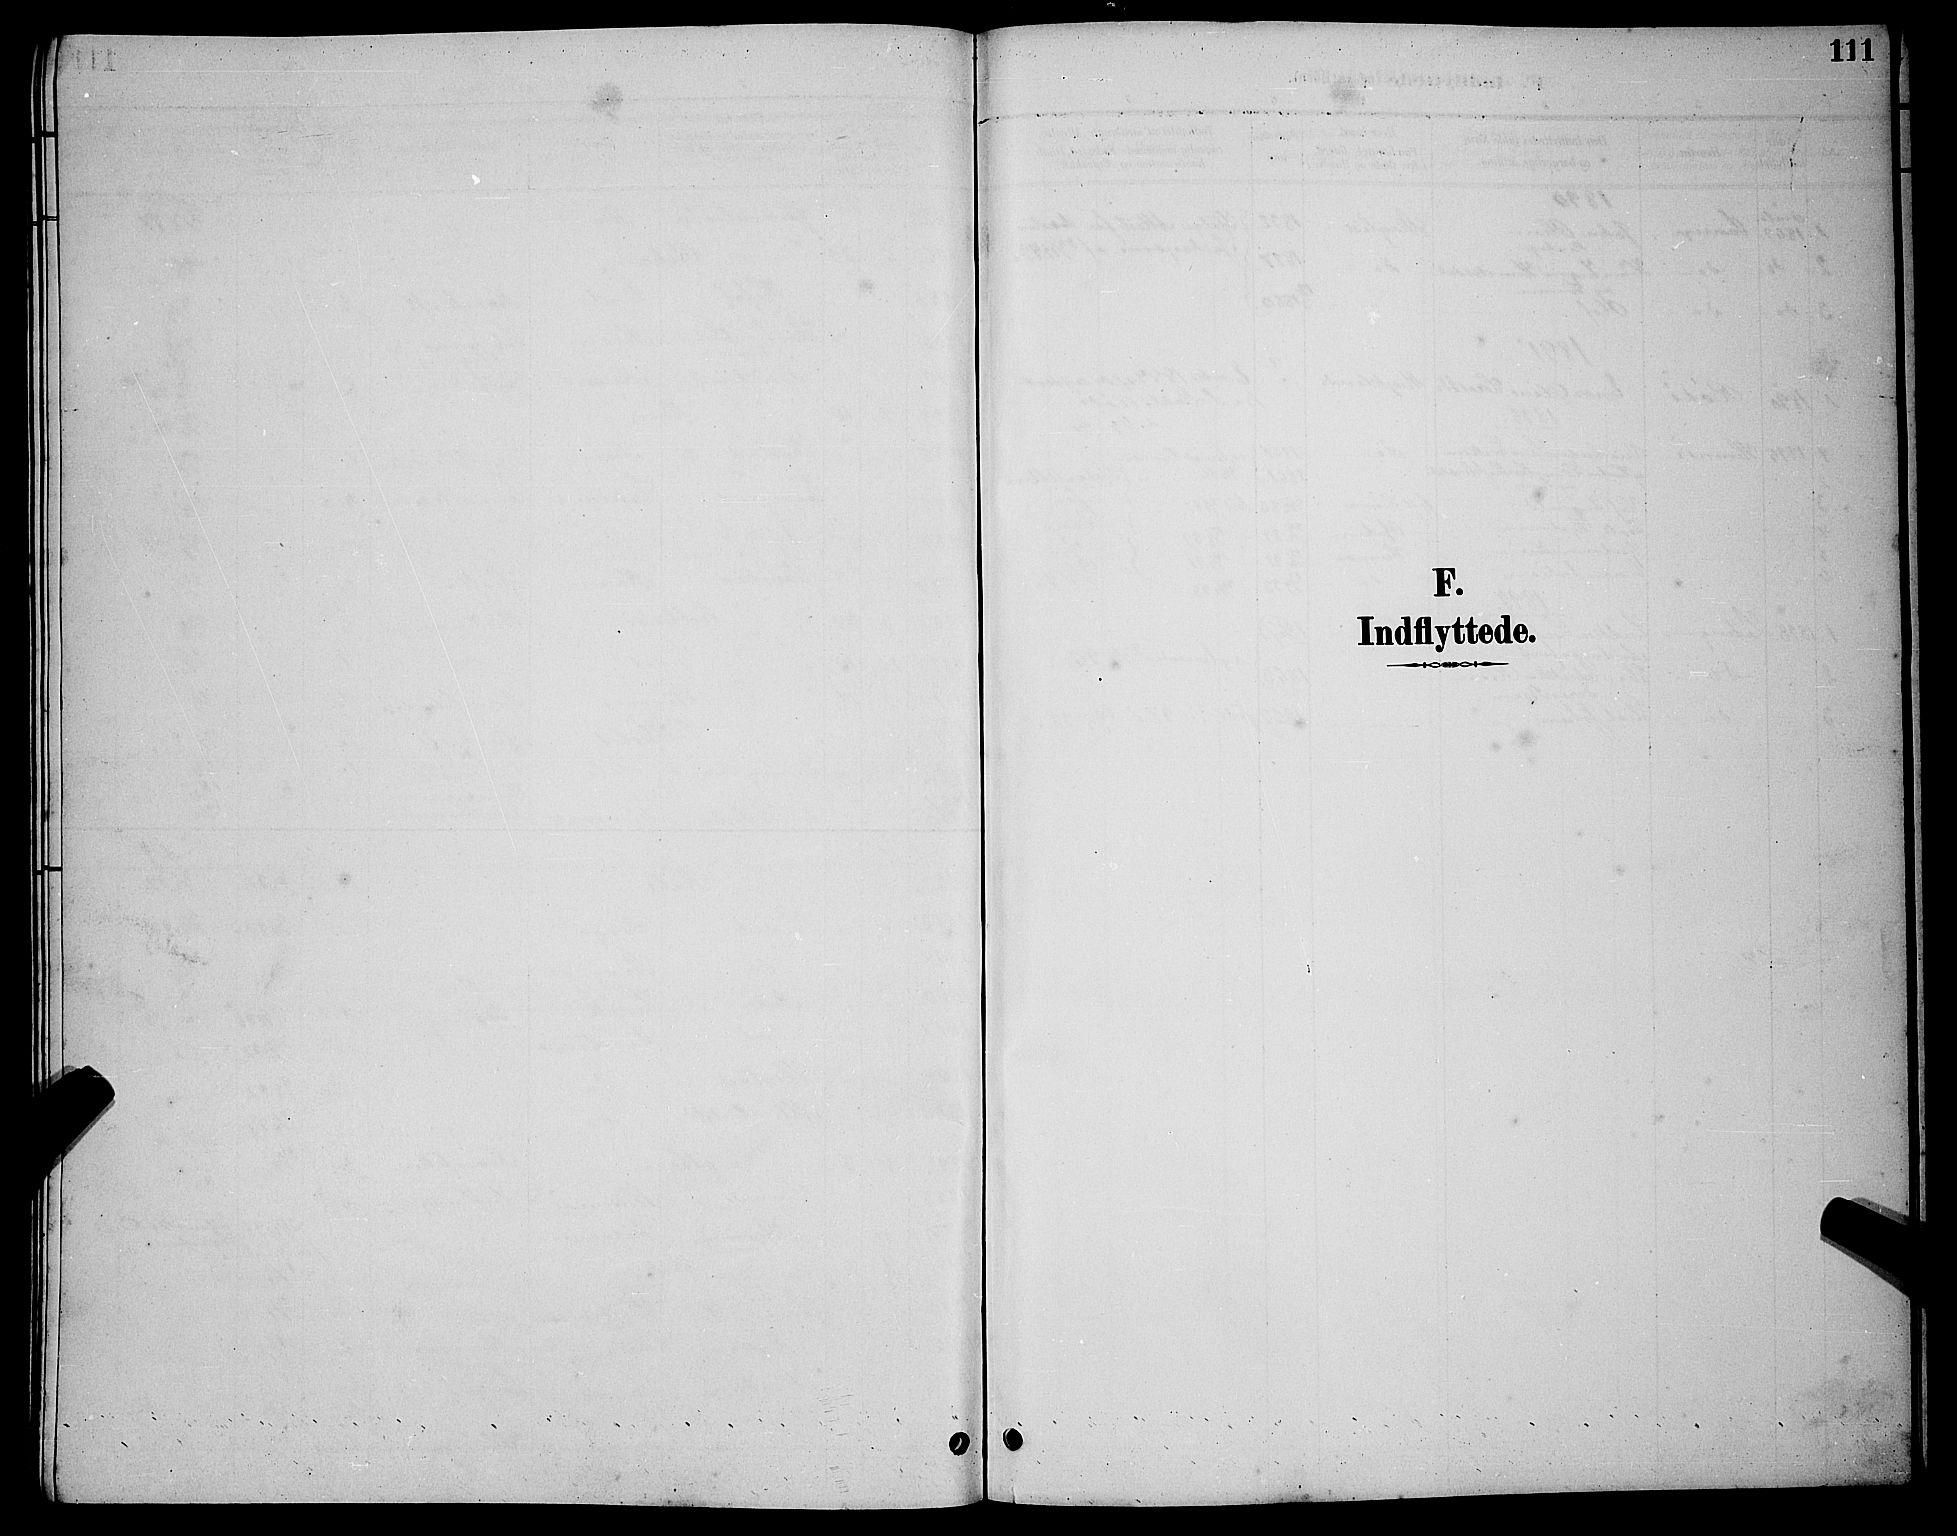 SATØ, Tranøy sokneprestkontor, I/Ia/Iab/L0004klokker: Parish register (copy) no. 4, 1888-1901, p. 111